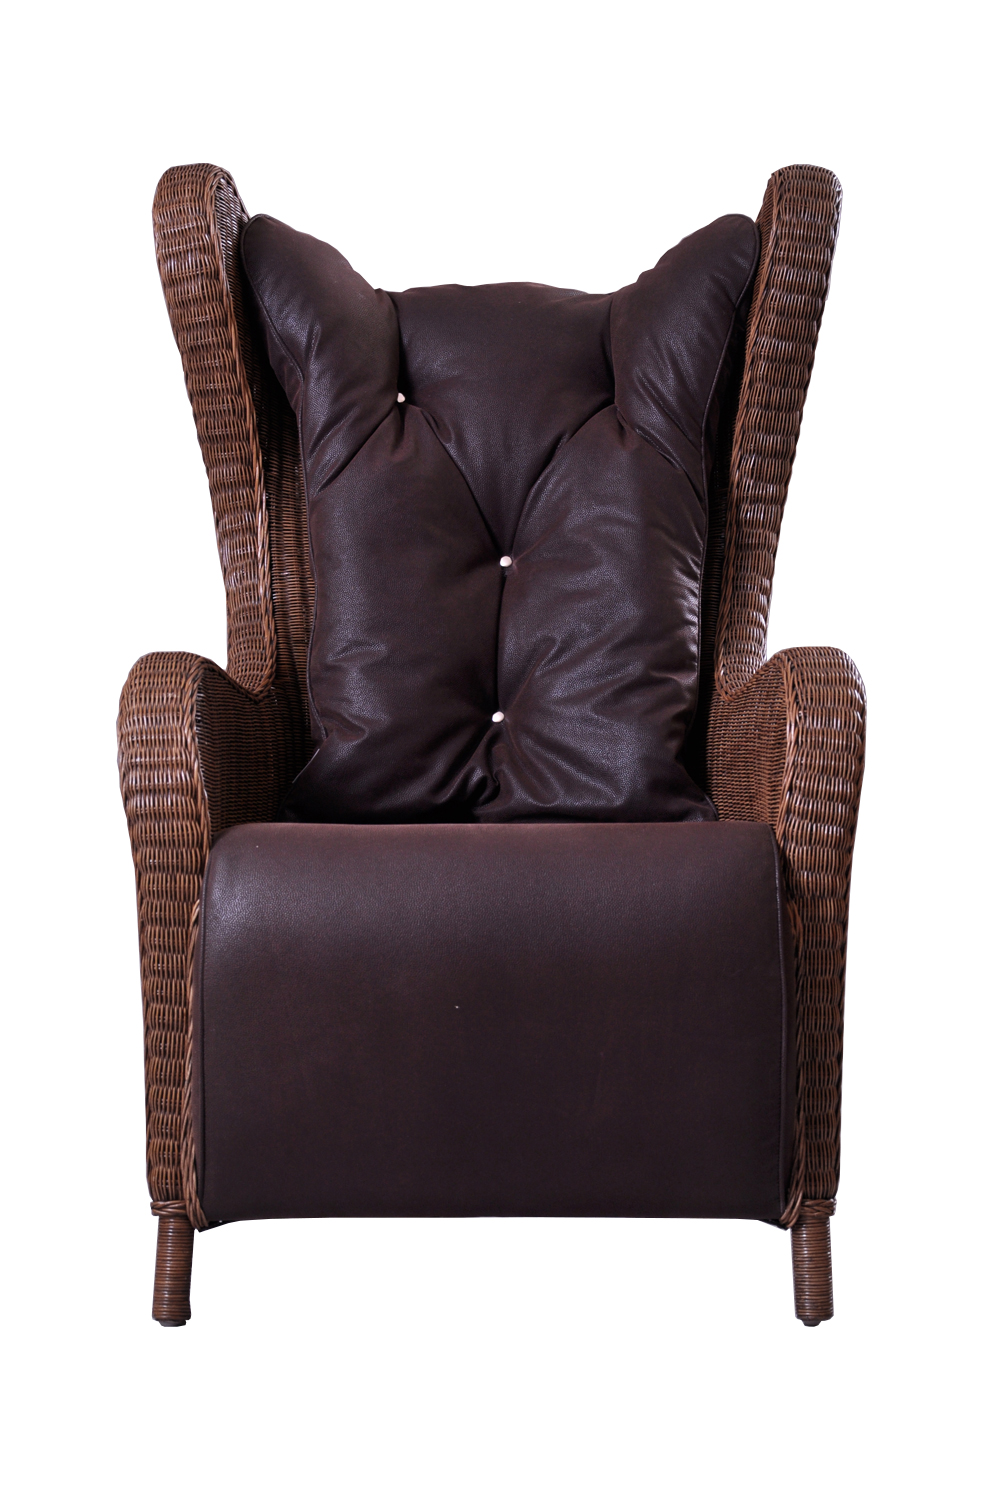 ohrensessel rattan alcantara fu hocker naturrattan sessel rattansessel geflecht ebay. Black Bedroom Furniture Sets. Home Design Ideas